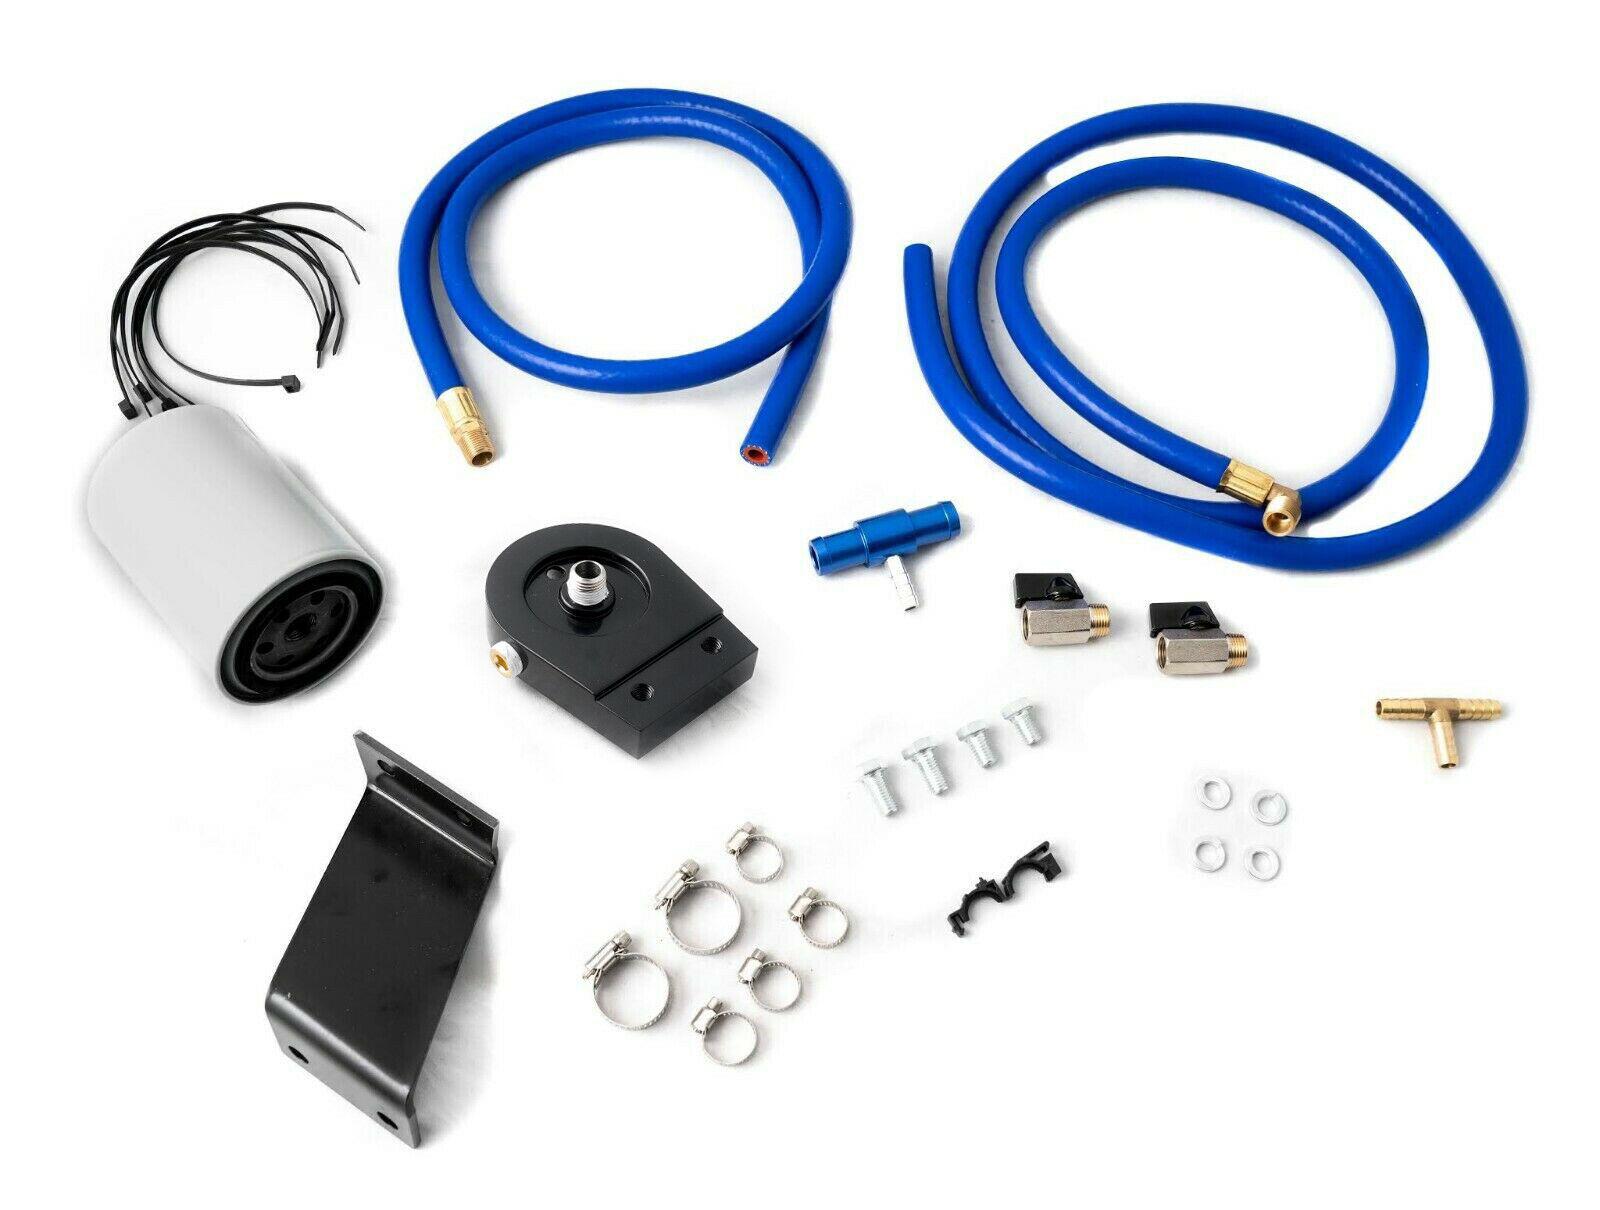 Details about Coolant Filtration Filter Kit 01-10 Chevy GM LB7 LLY LBZ LMM  Duramax Diesel 6 6L